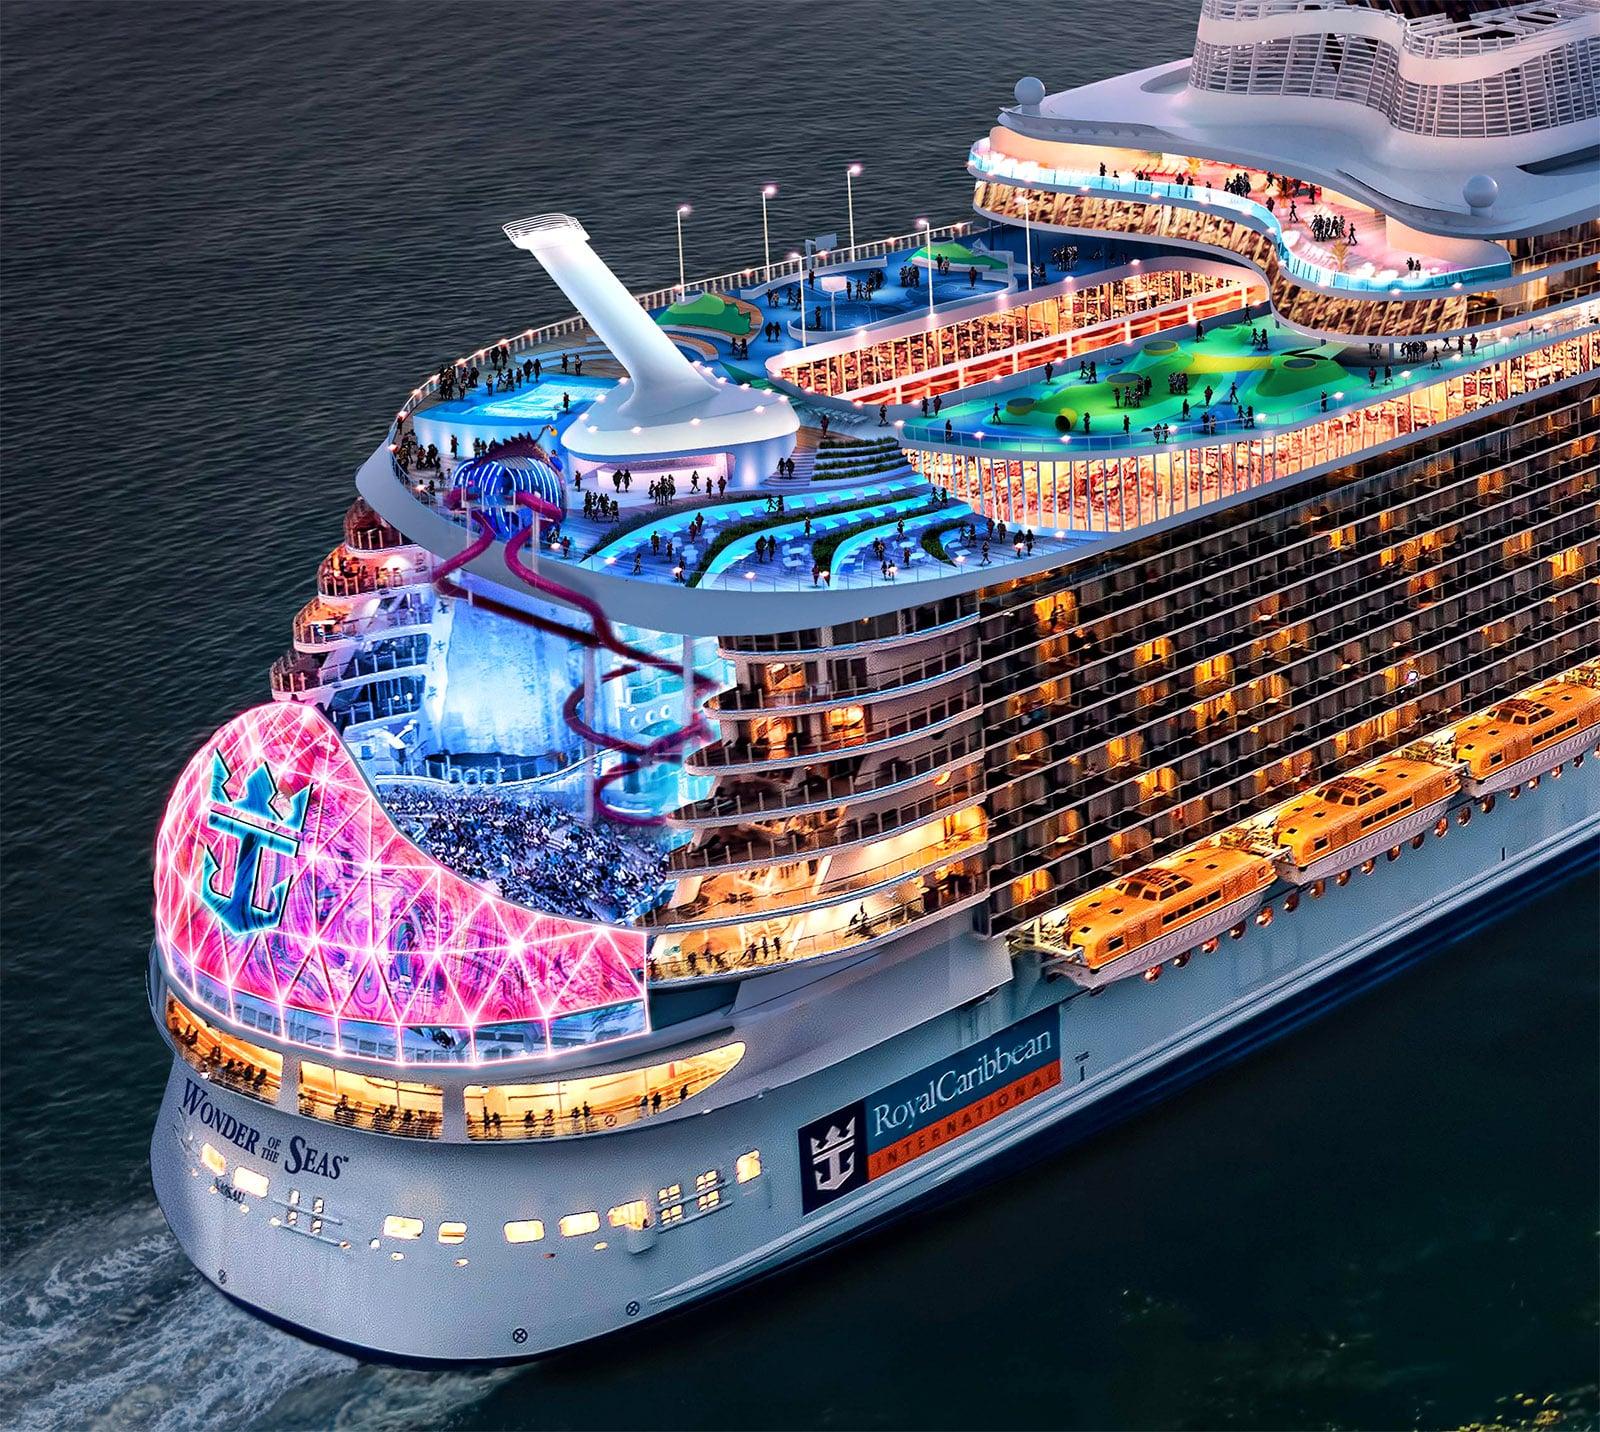 Royal Caribbean Delays New Oasis Class Ship Arrival In 2021 Royal Caribbean Blog